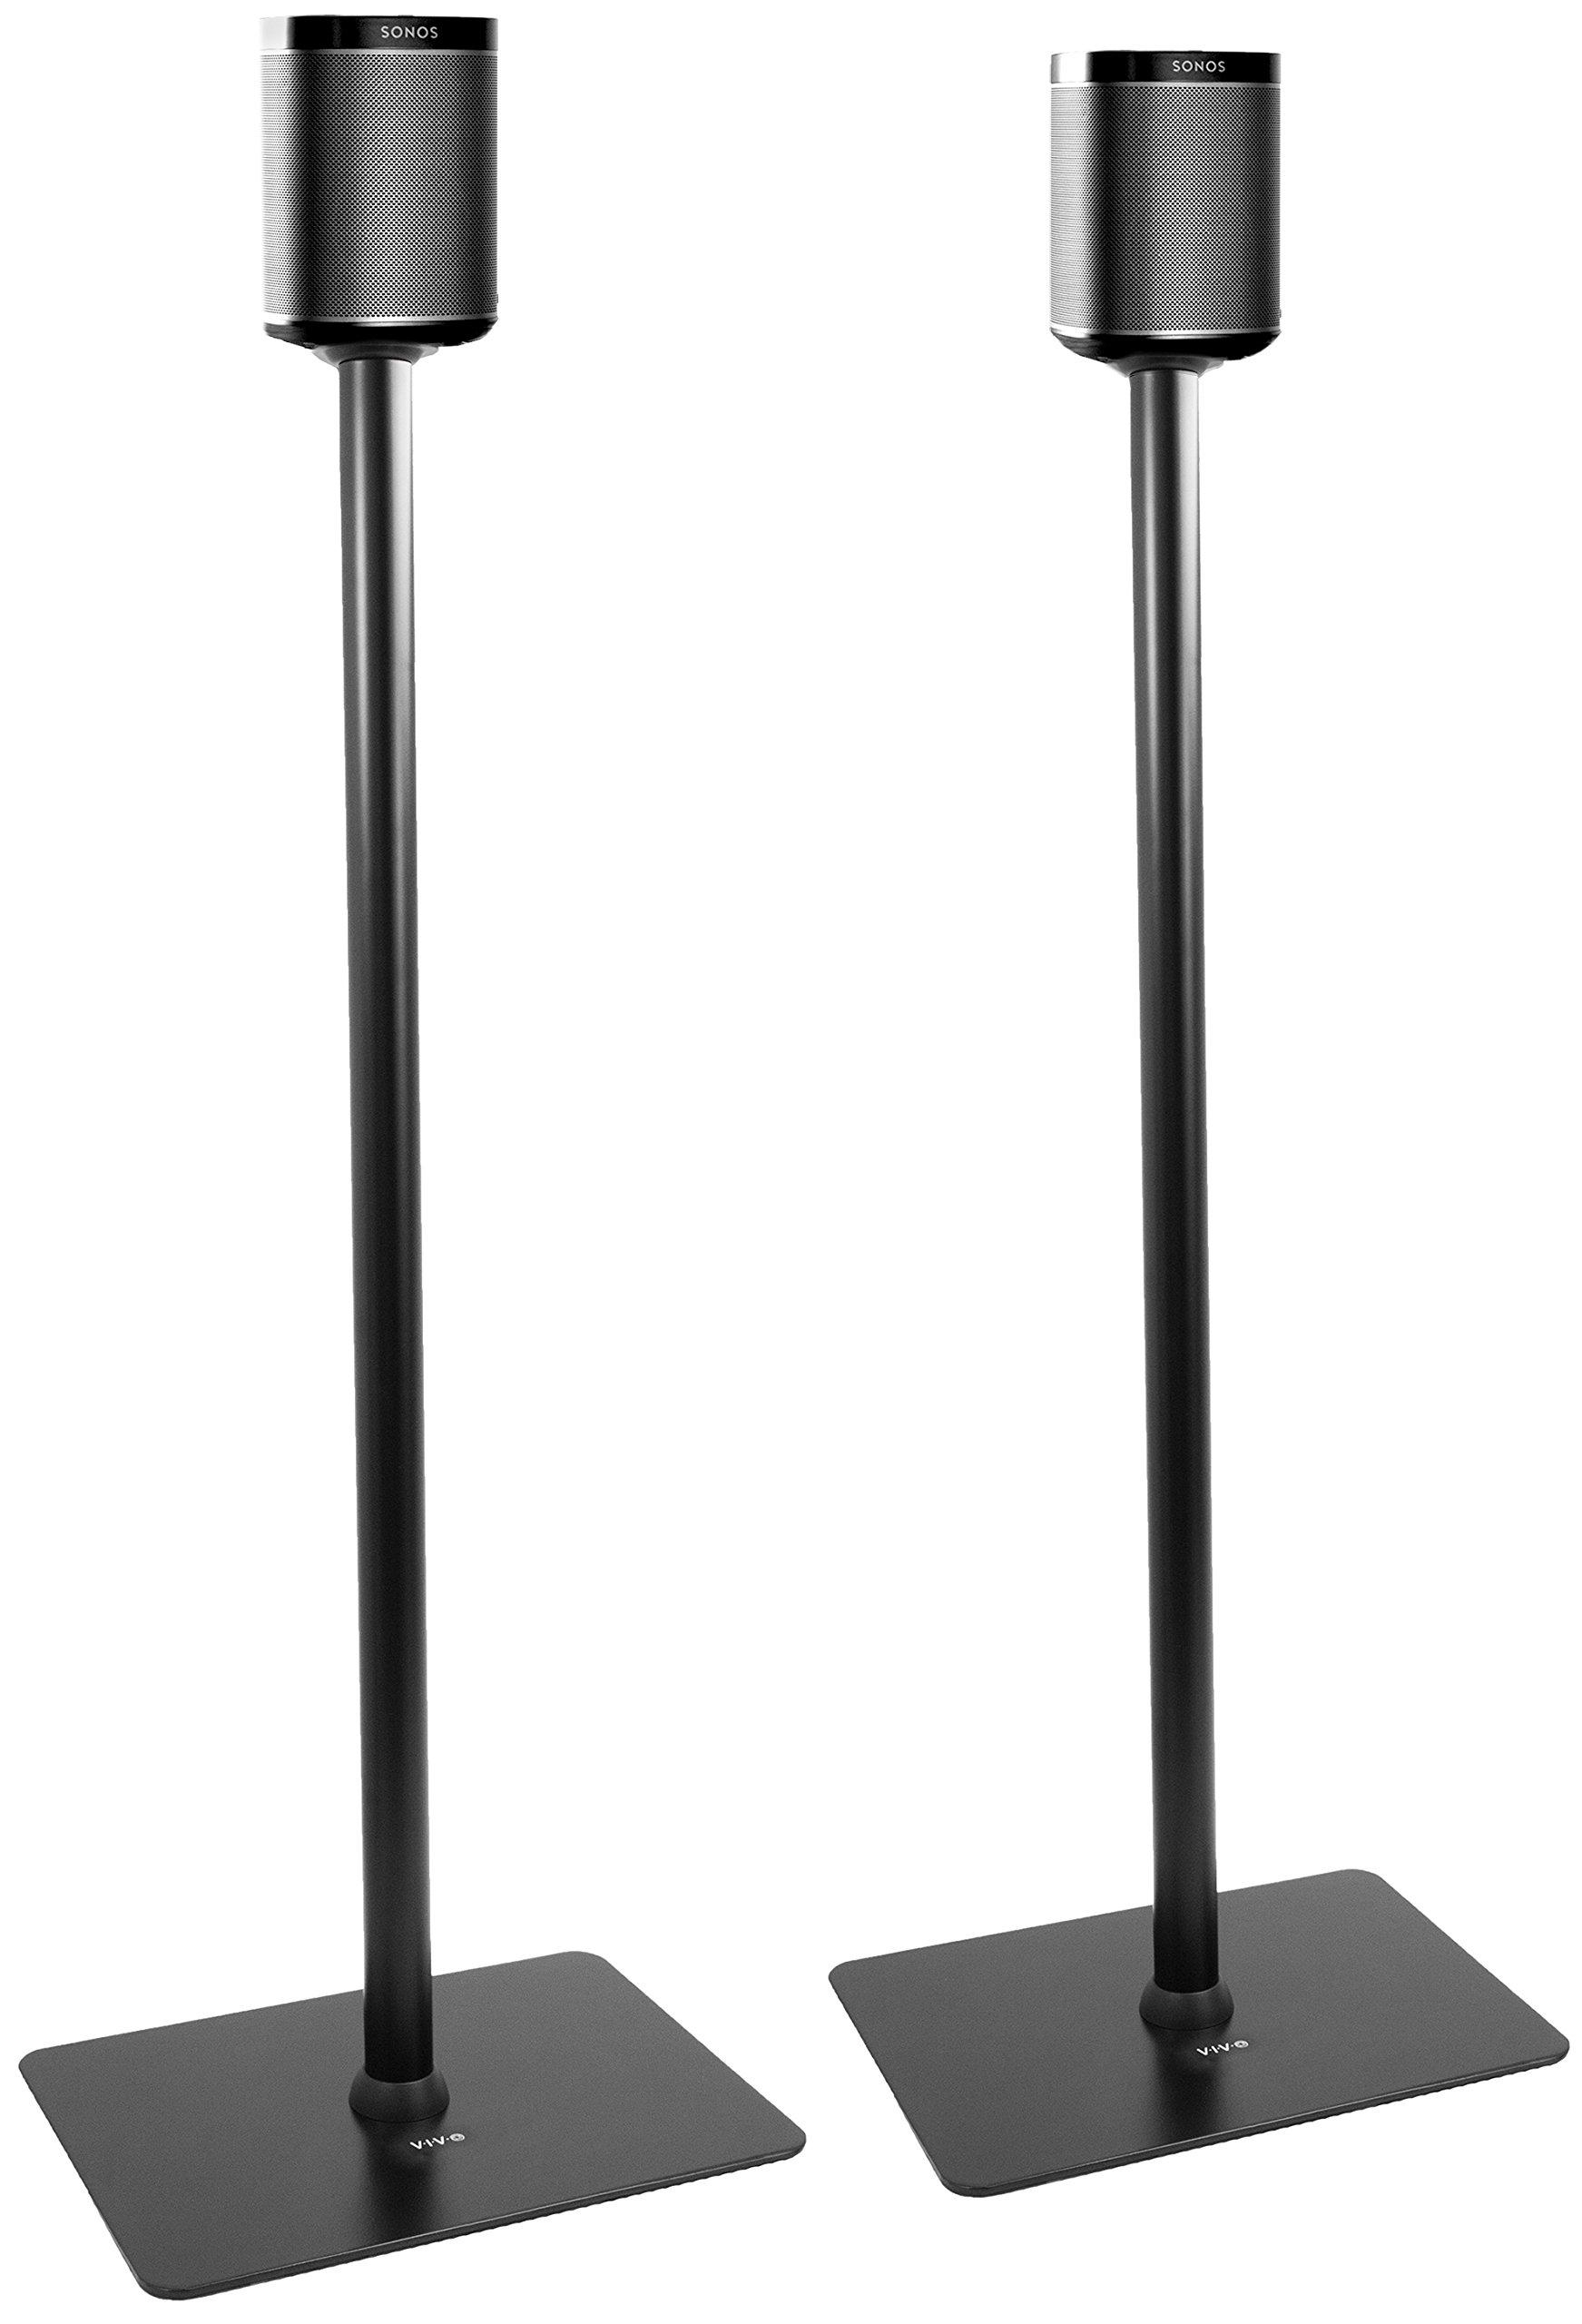 VIVO Black Speaker Floor Stands (Pair) Designed for SONOS PLAY 1 and PLAY 3 Audio Speaker Mounts (STAND-SP03C)